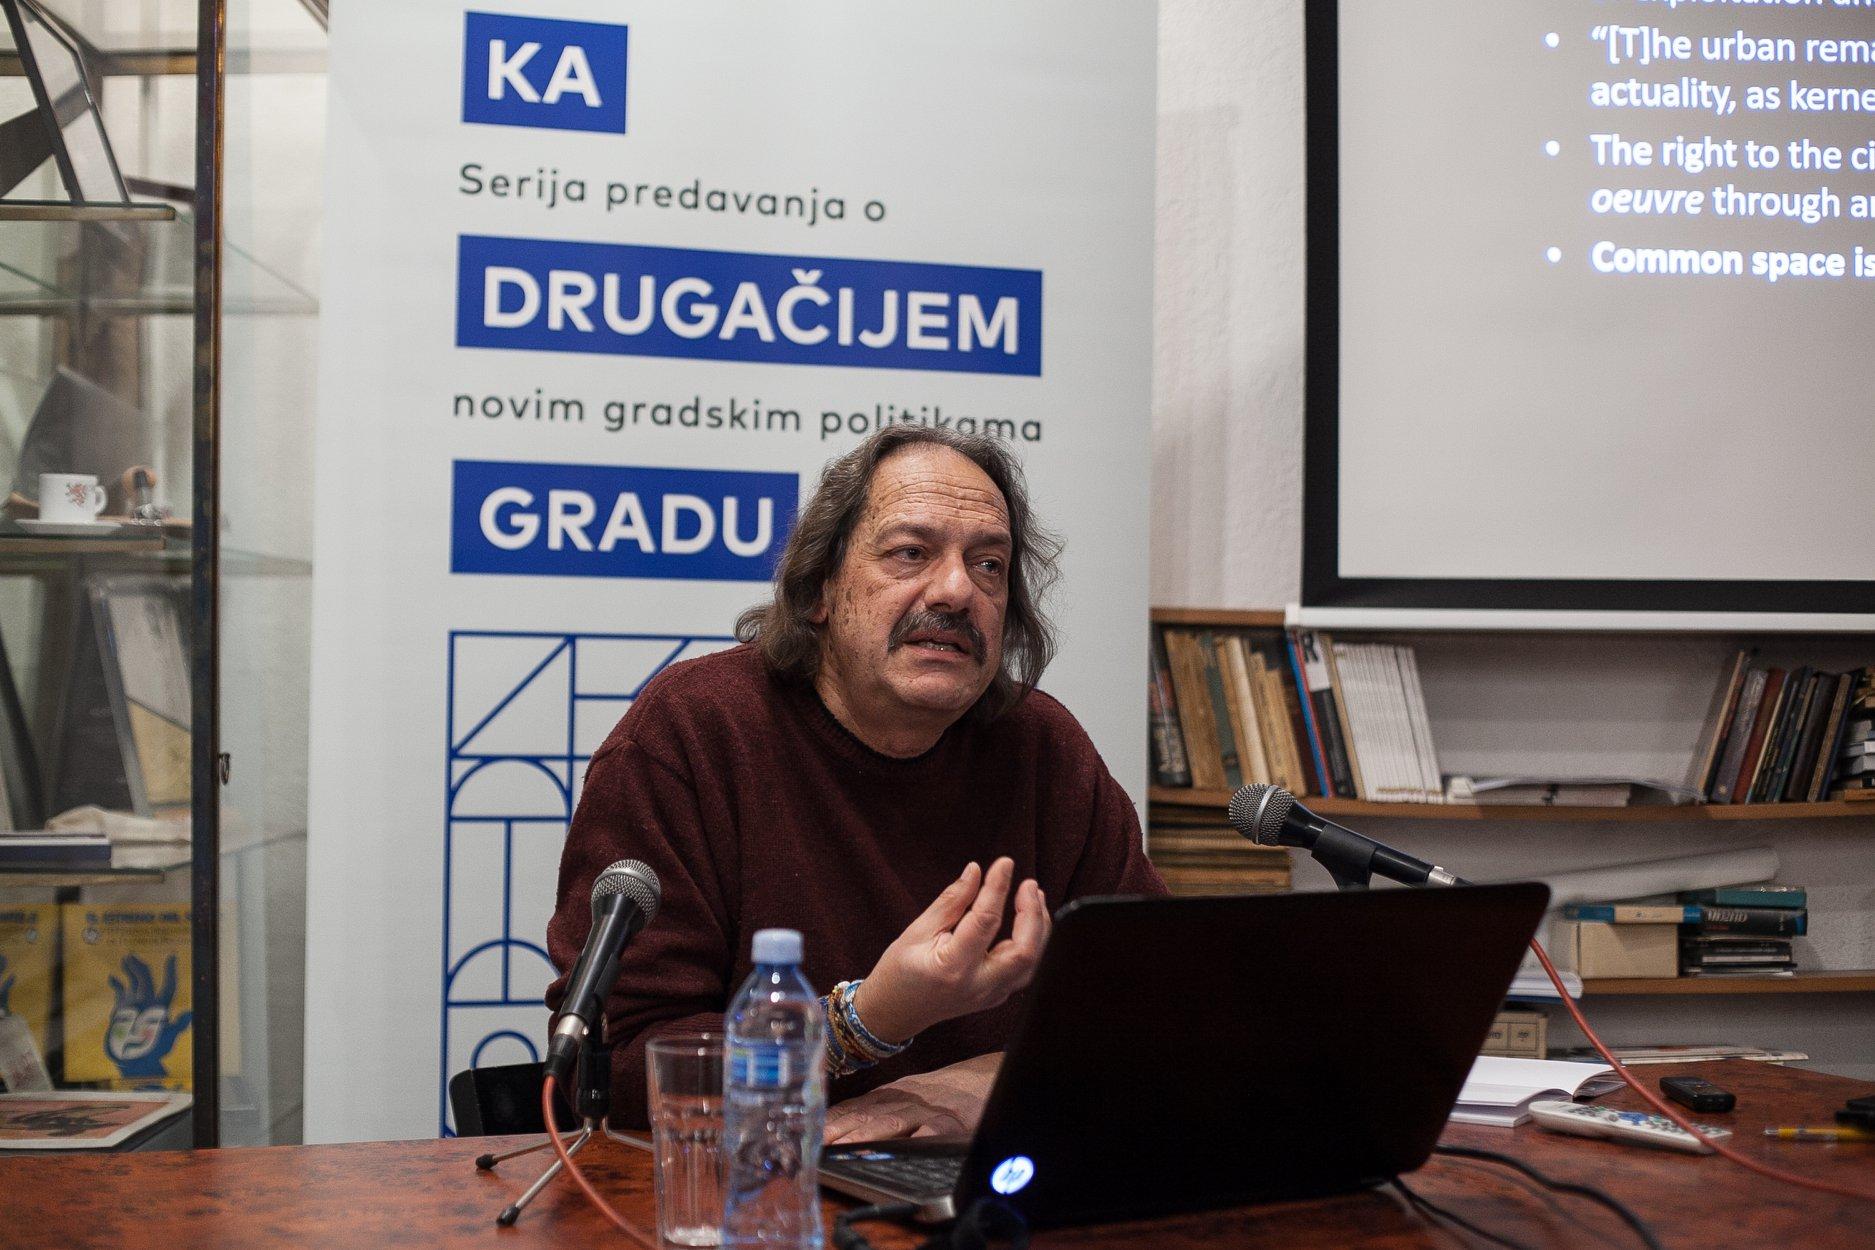 Foto: Dušan Rajić / Ministarstvo prostora / Facebook